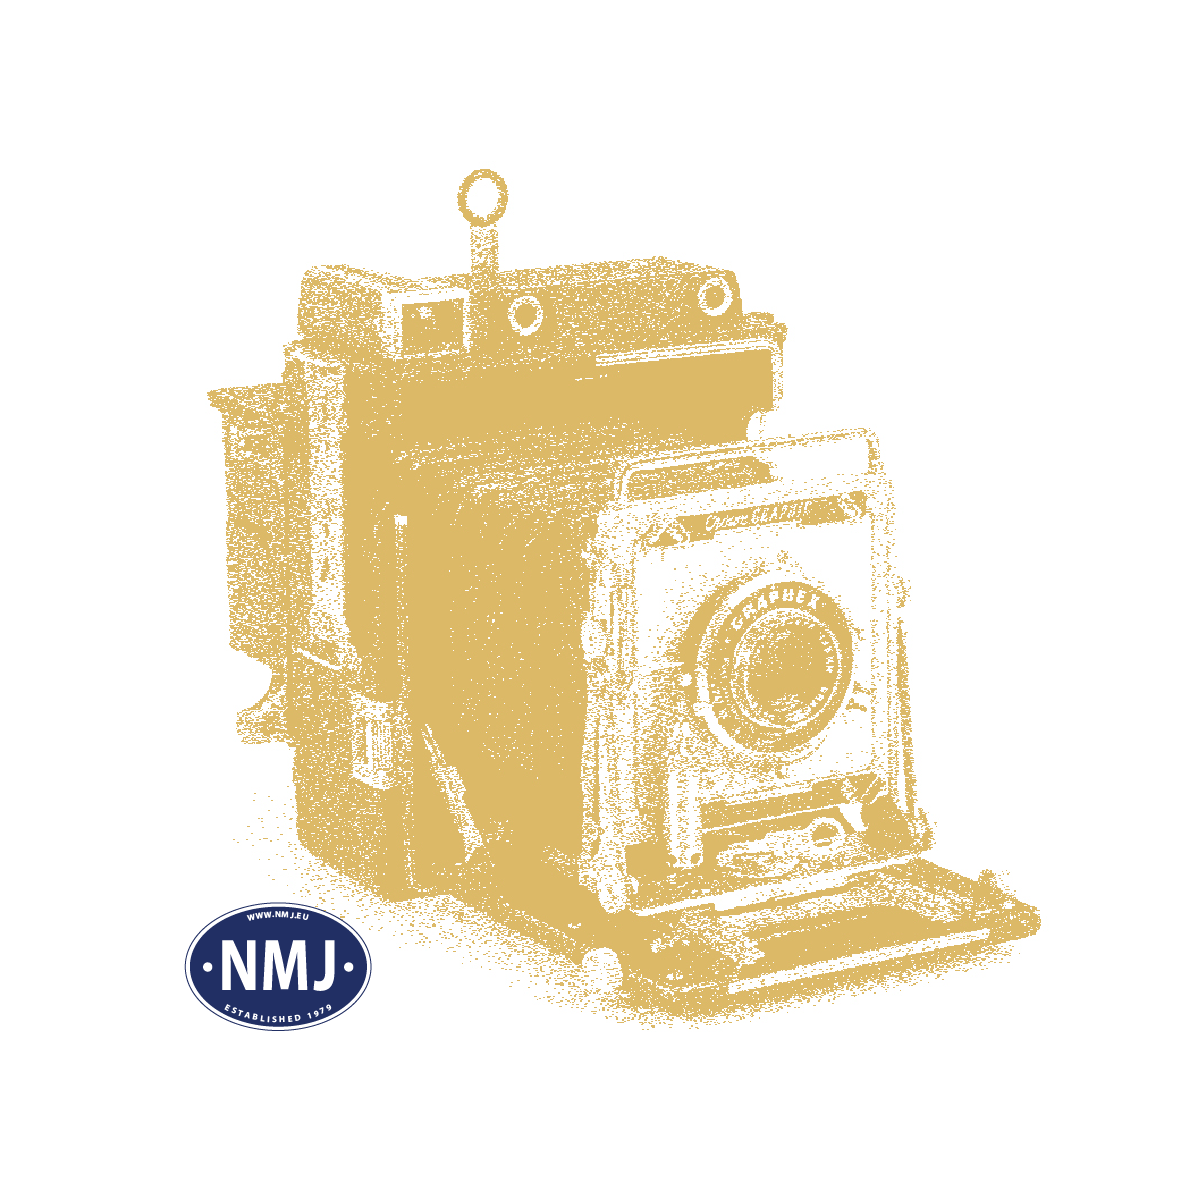 NOC15051 - Tømrere